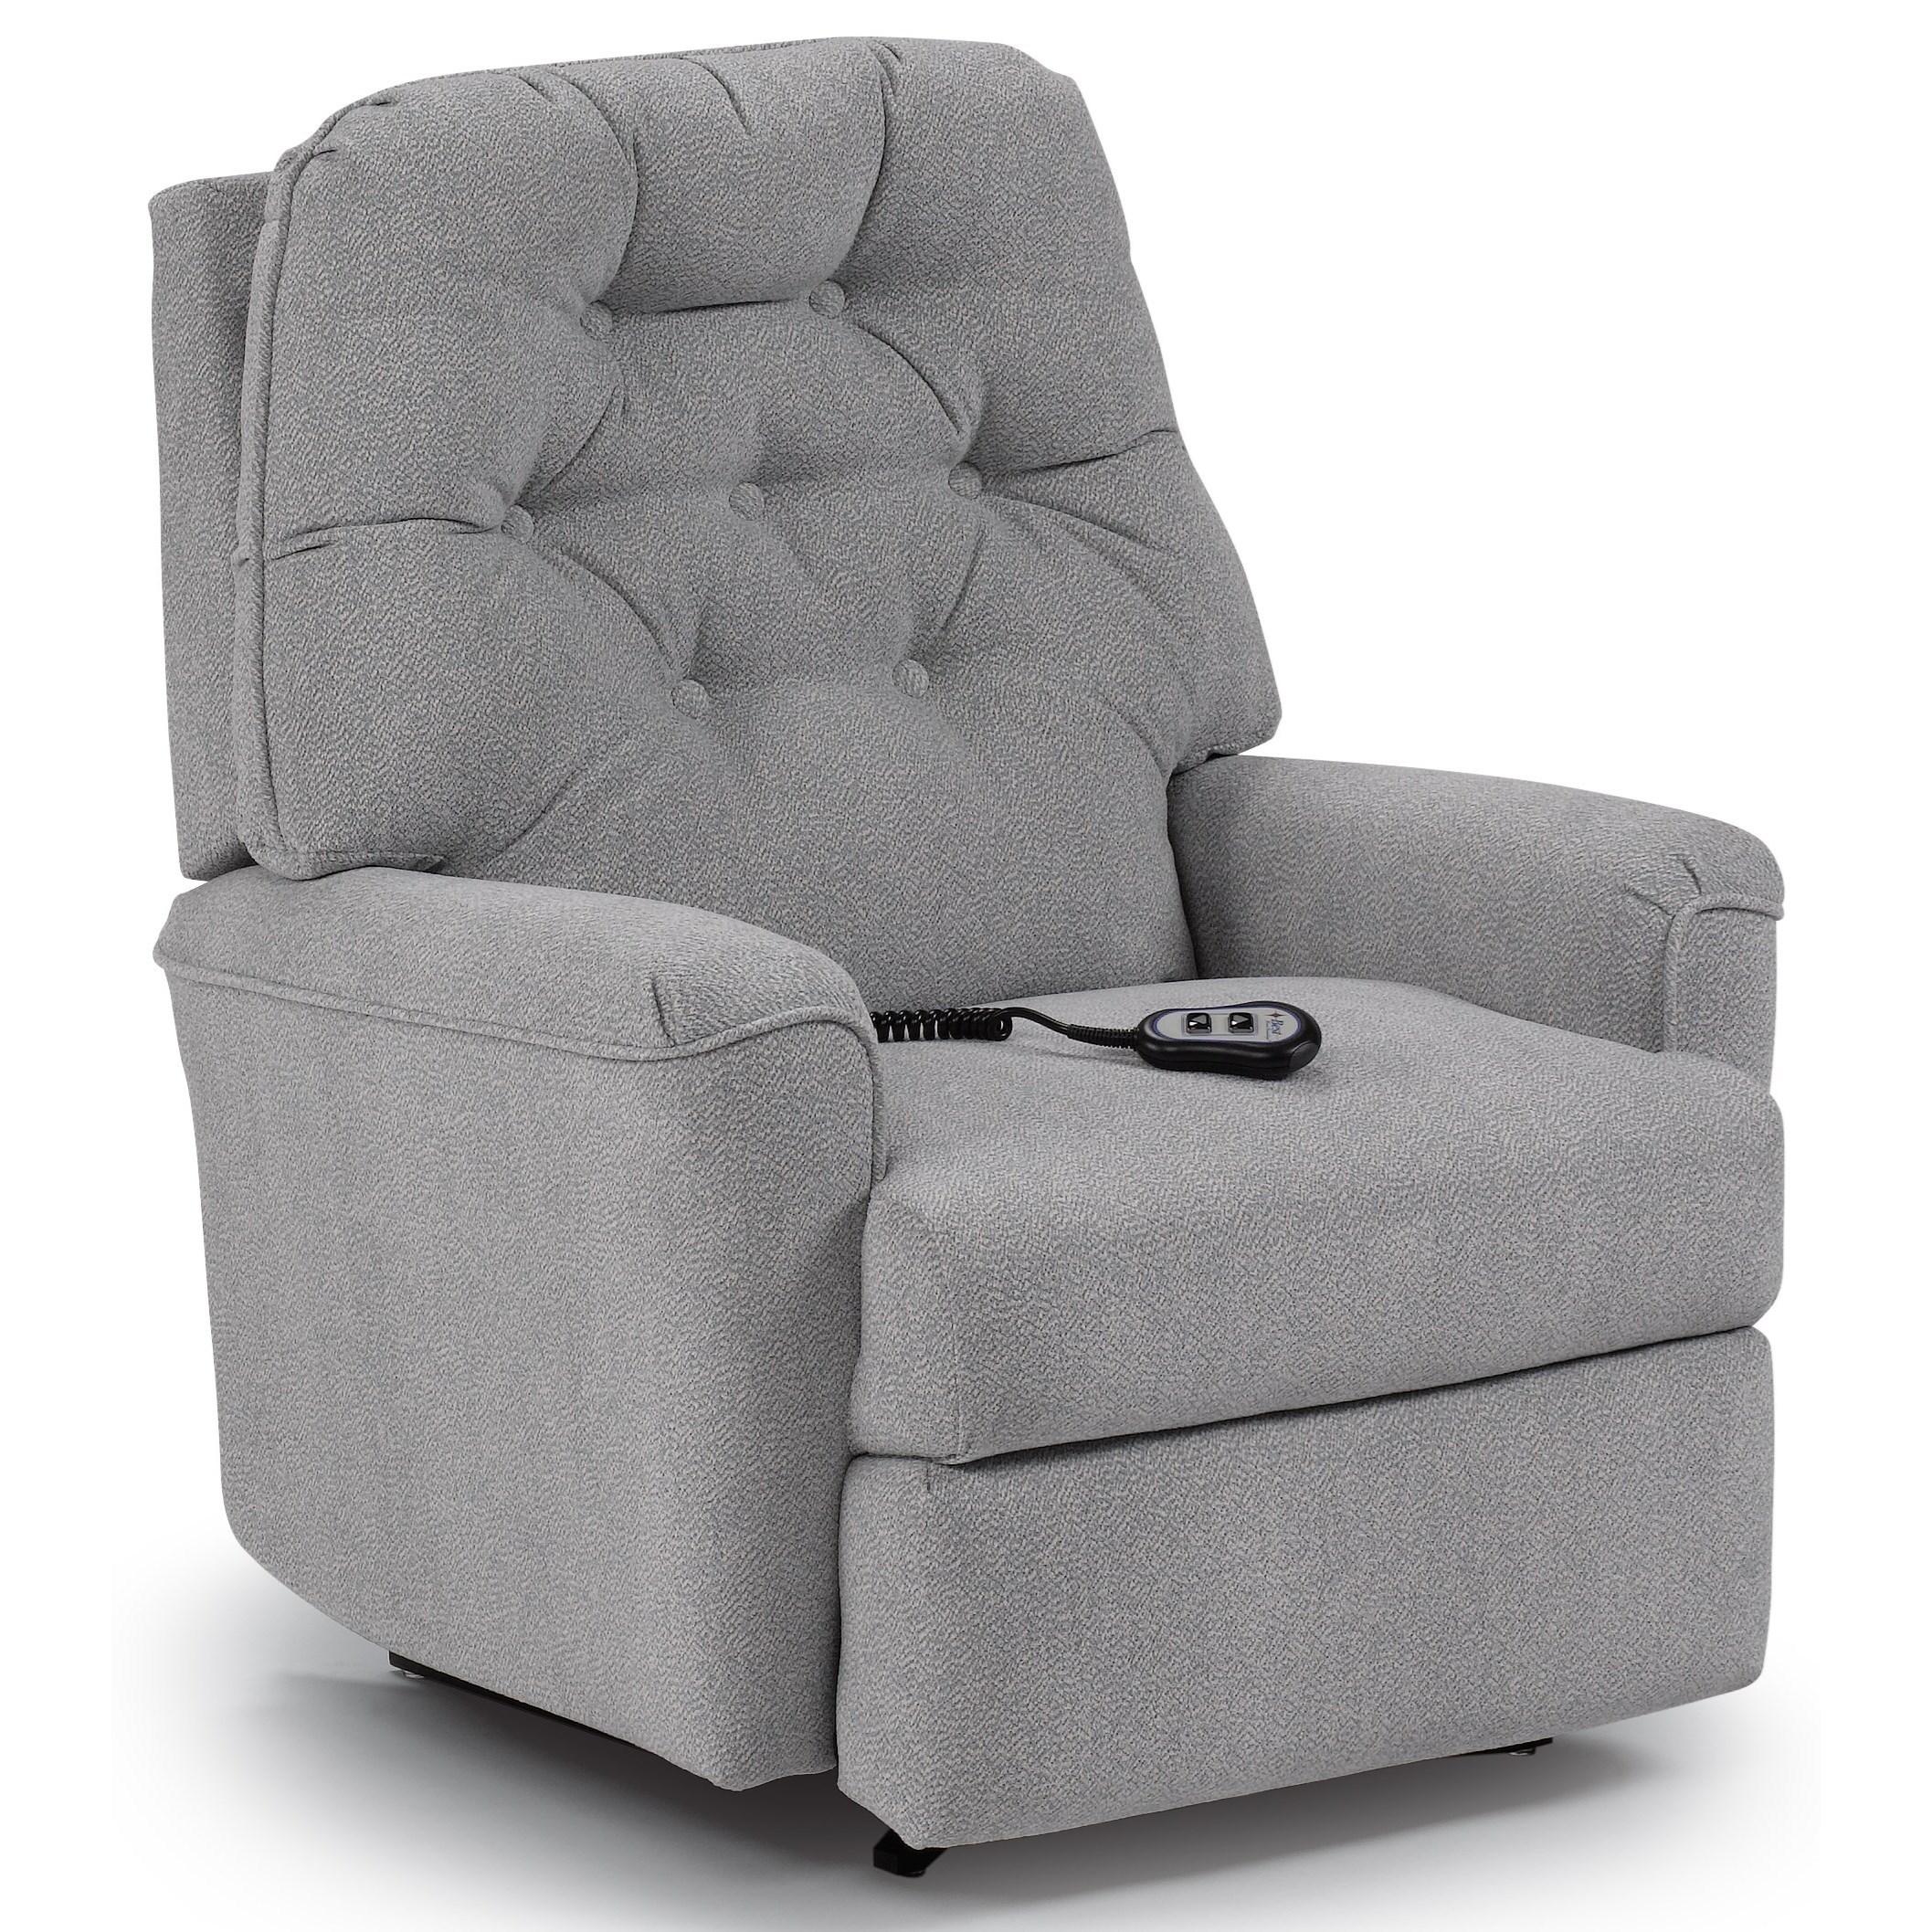 rocker and recliner chair mechanics hydraulic stool best home furnishings recliners medium cara power